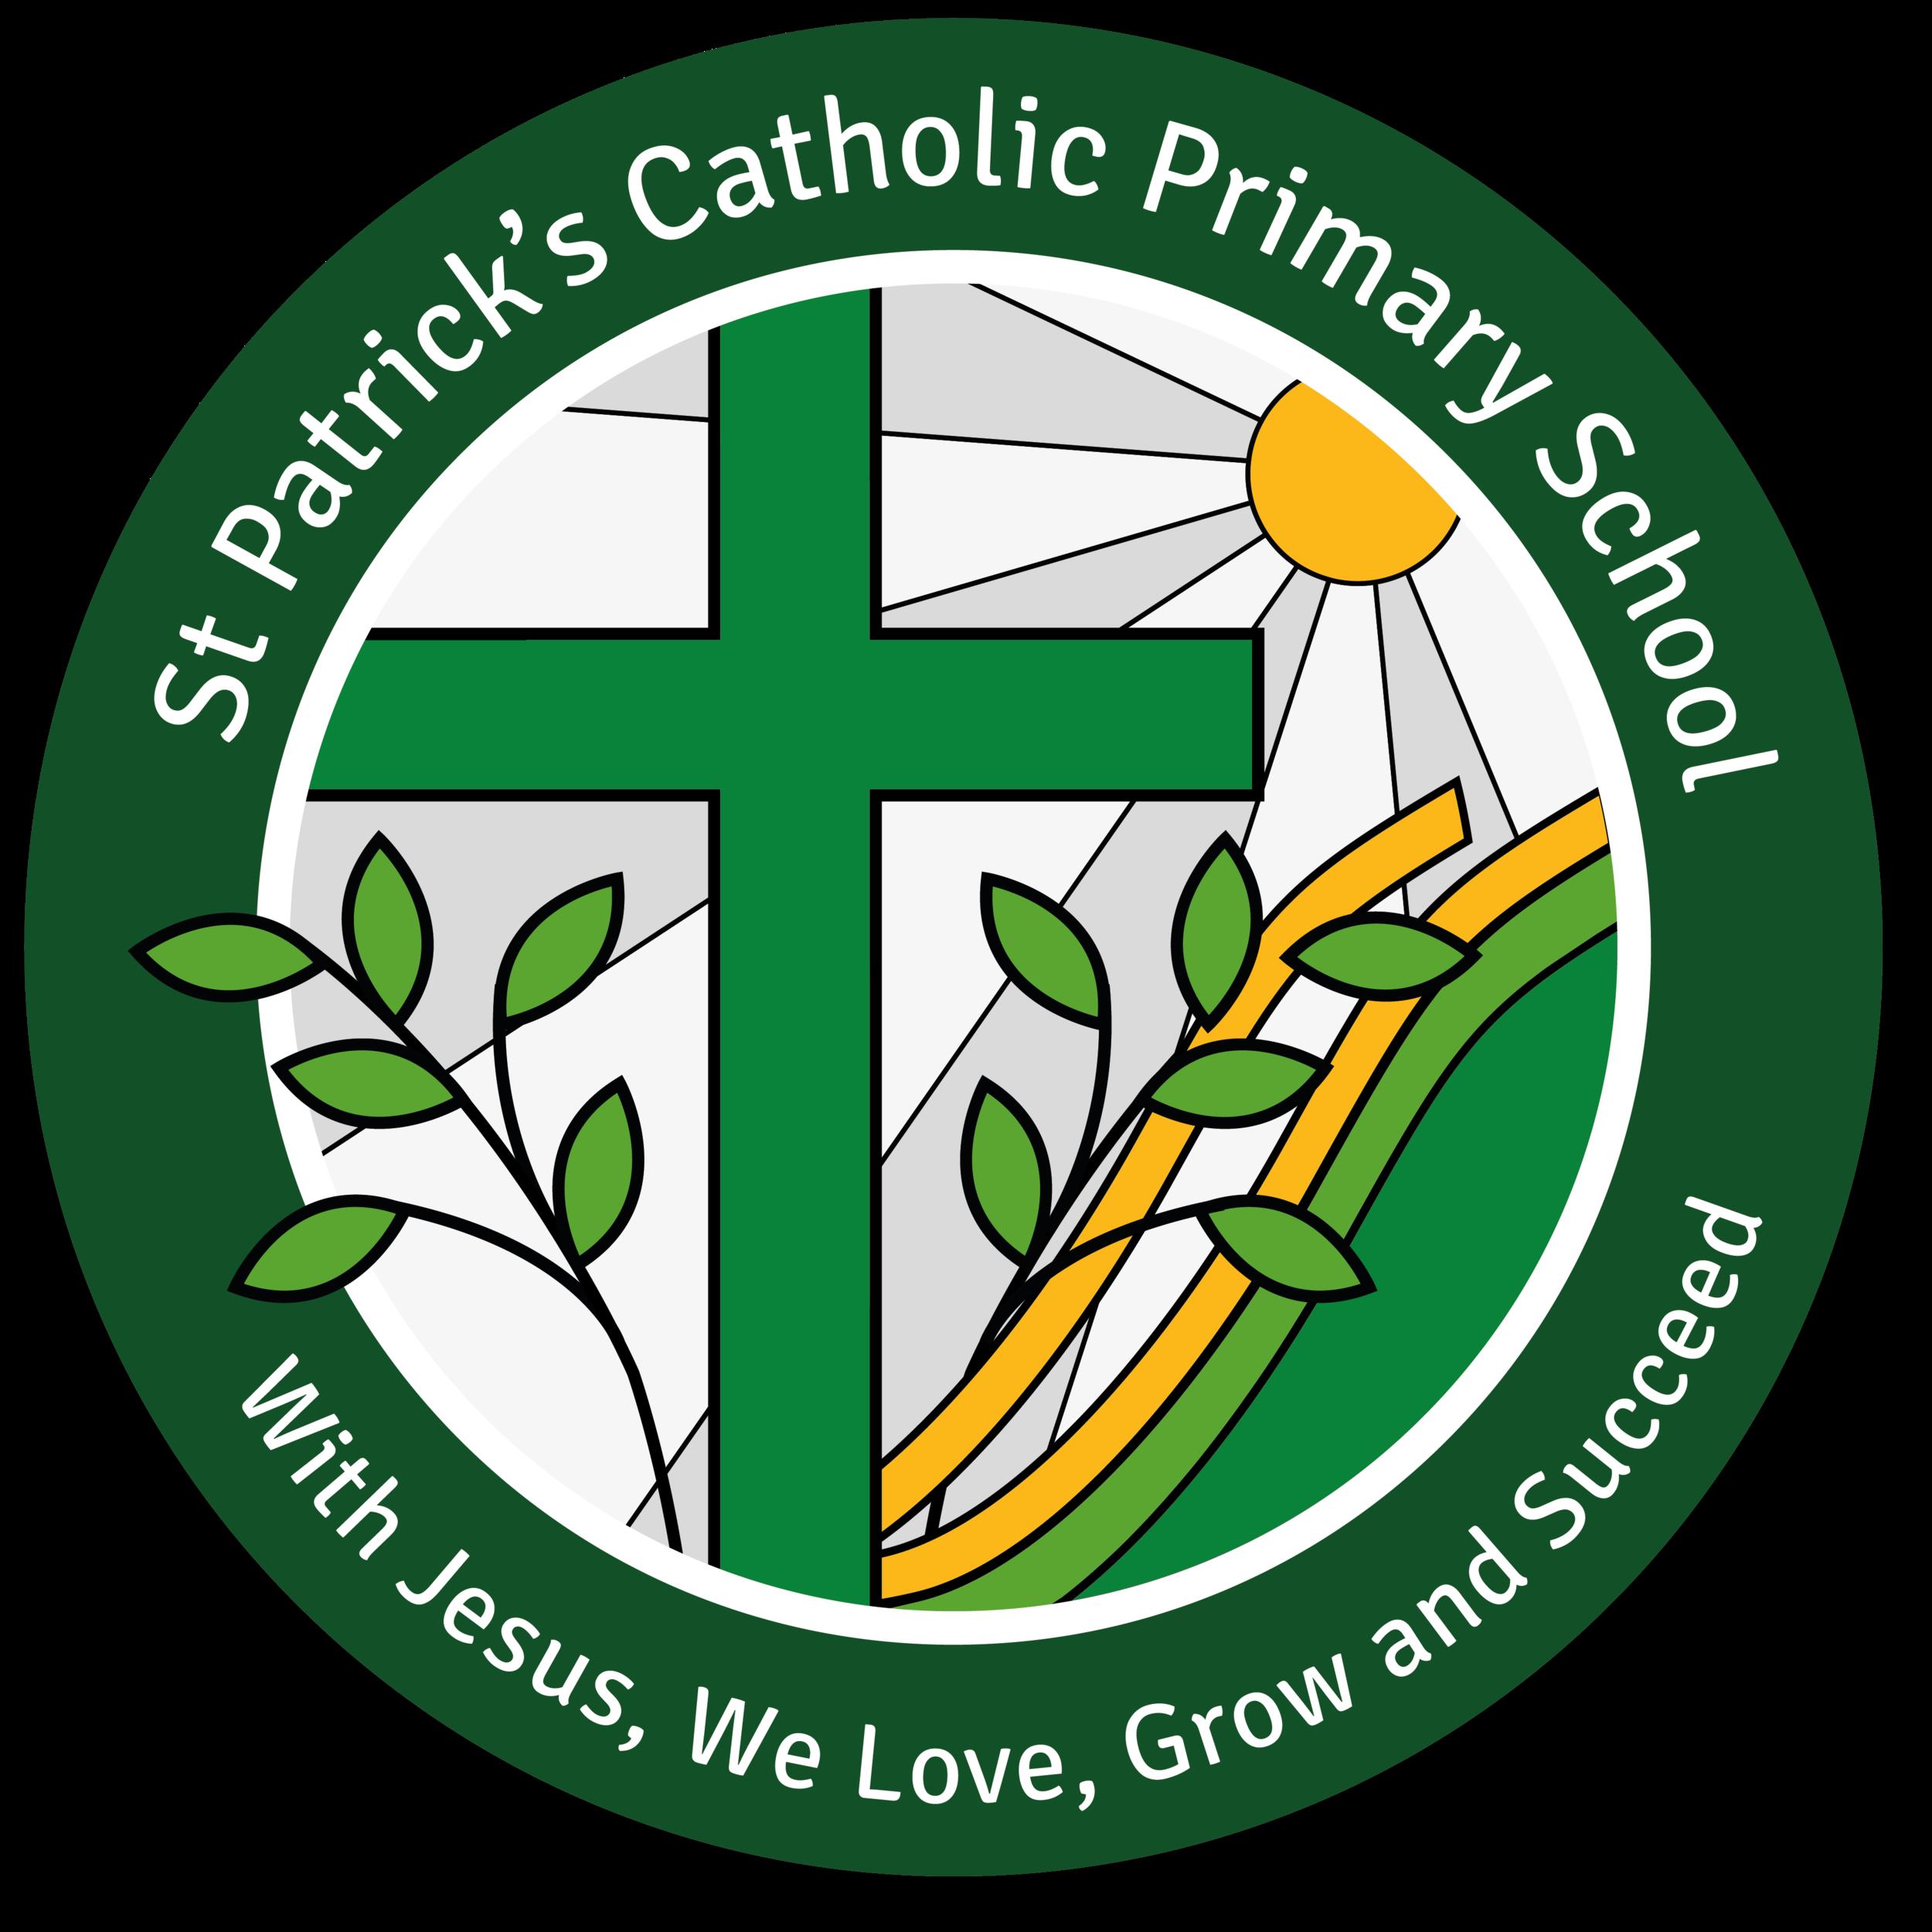 st_patricks_catholic_primary_school_logo.png